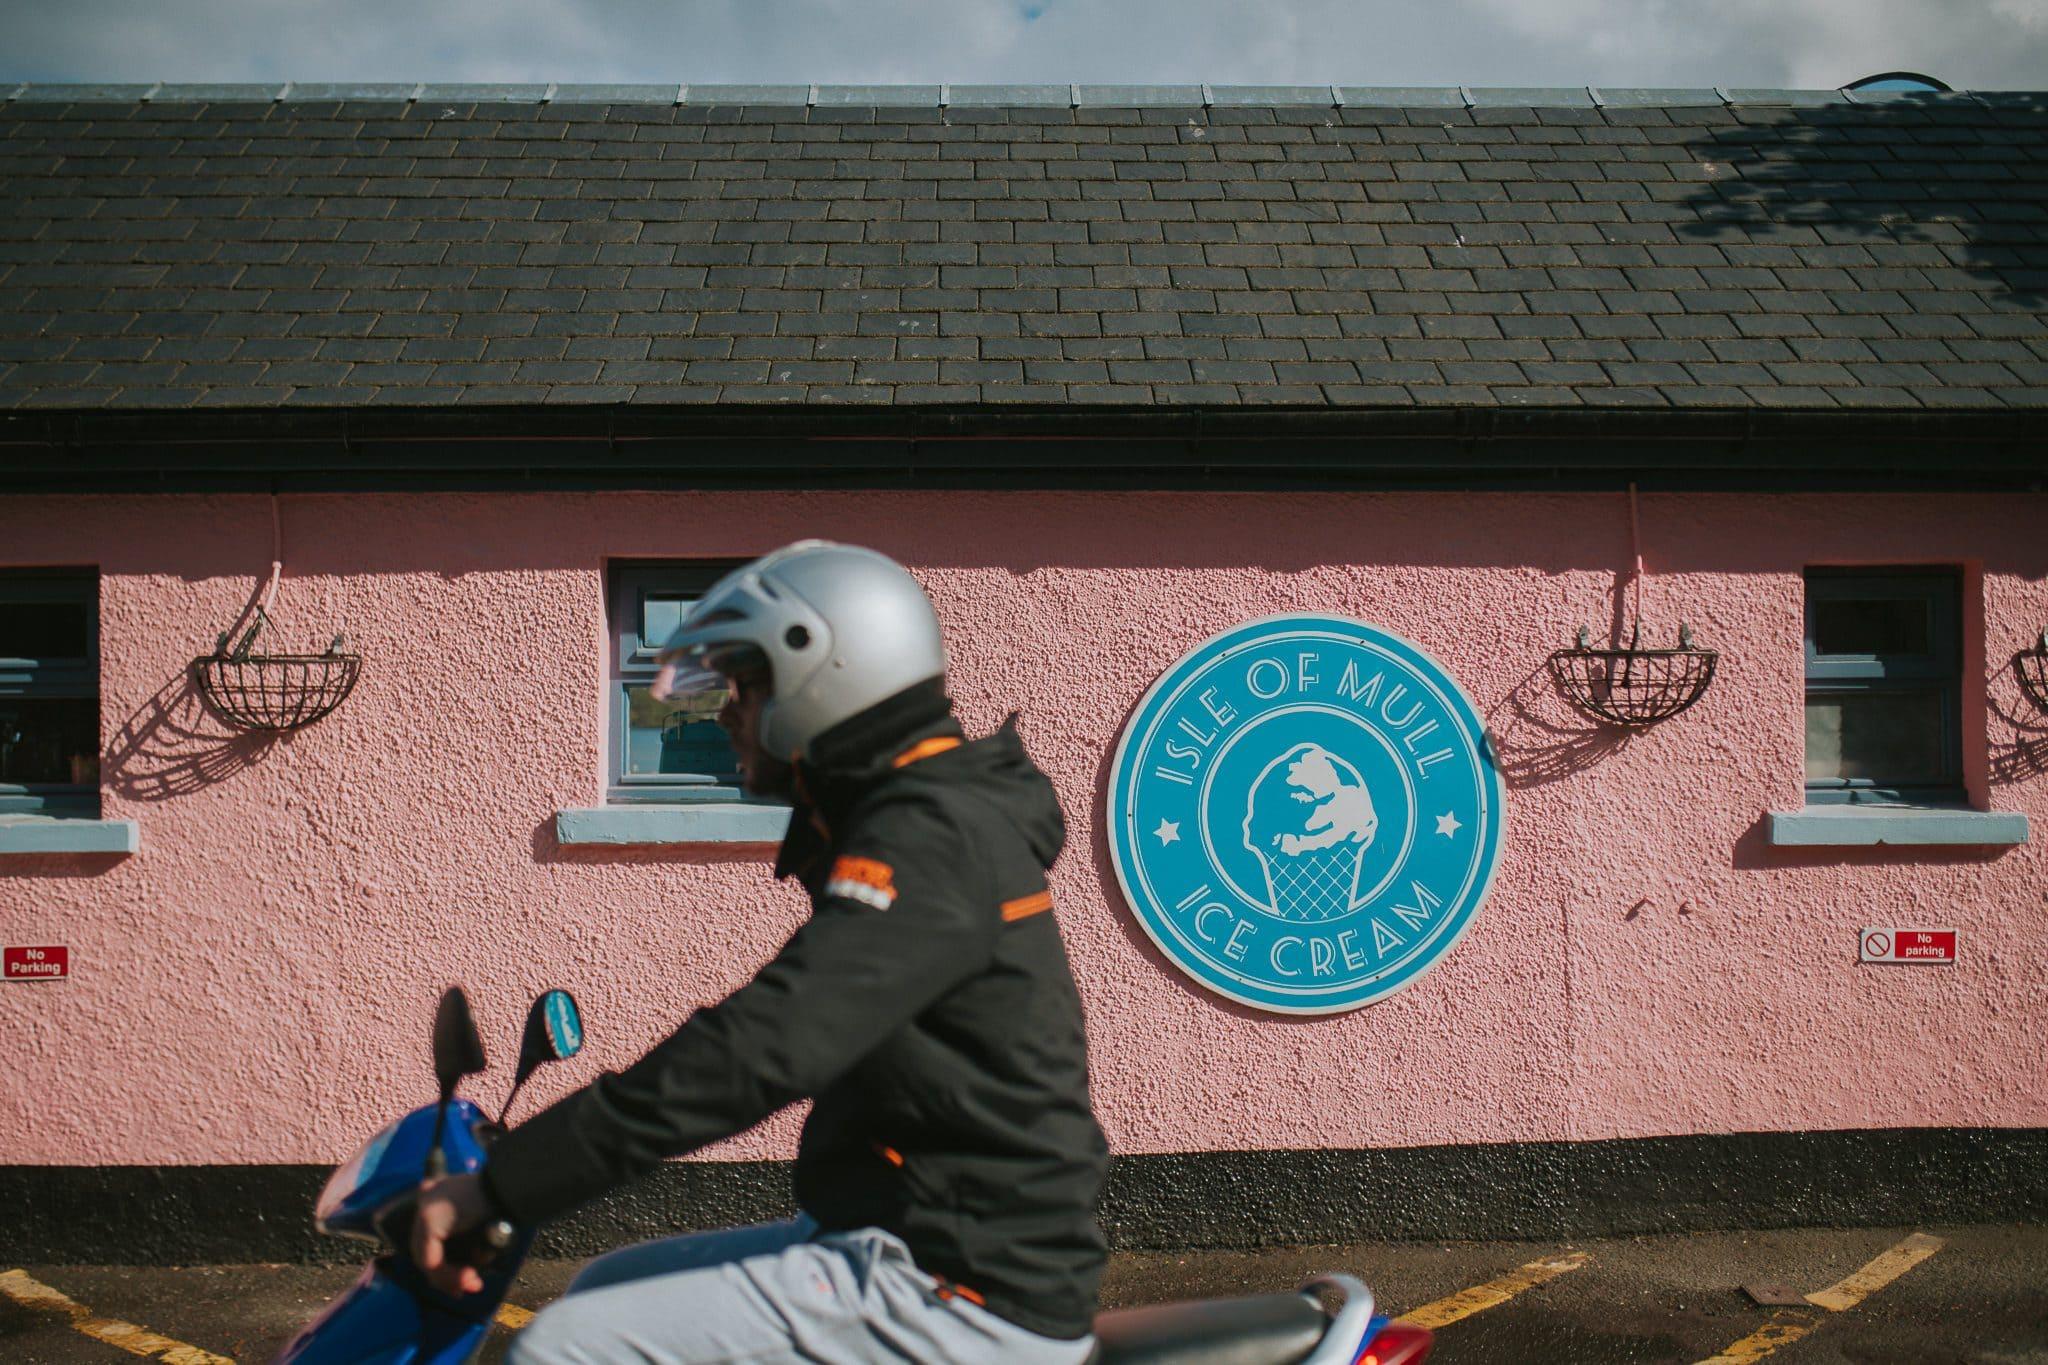 Isle of Mull Ice Cream